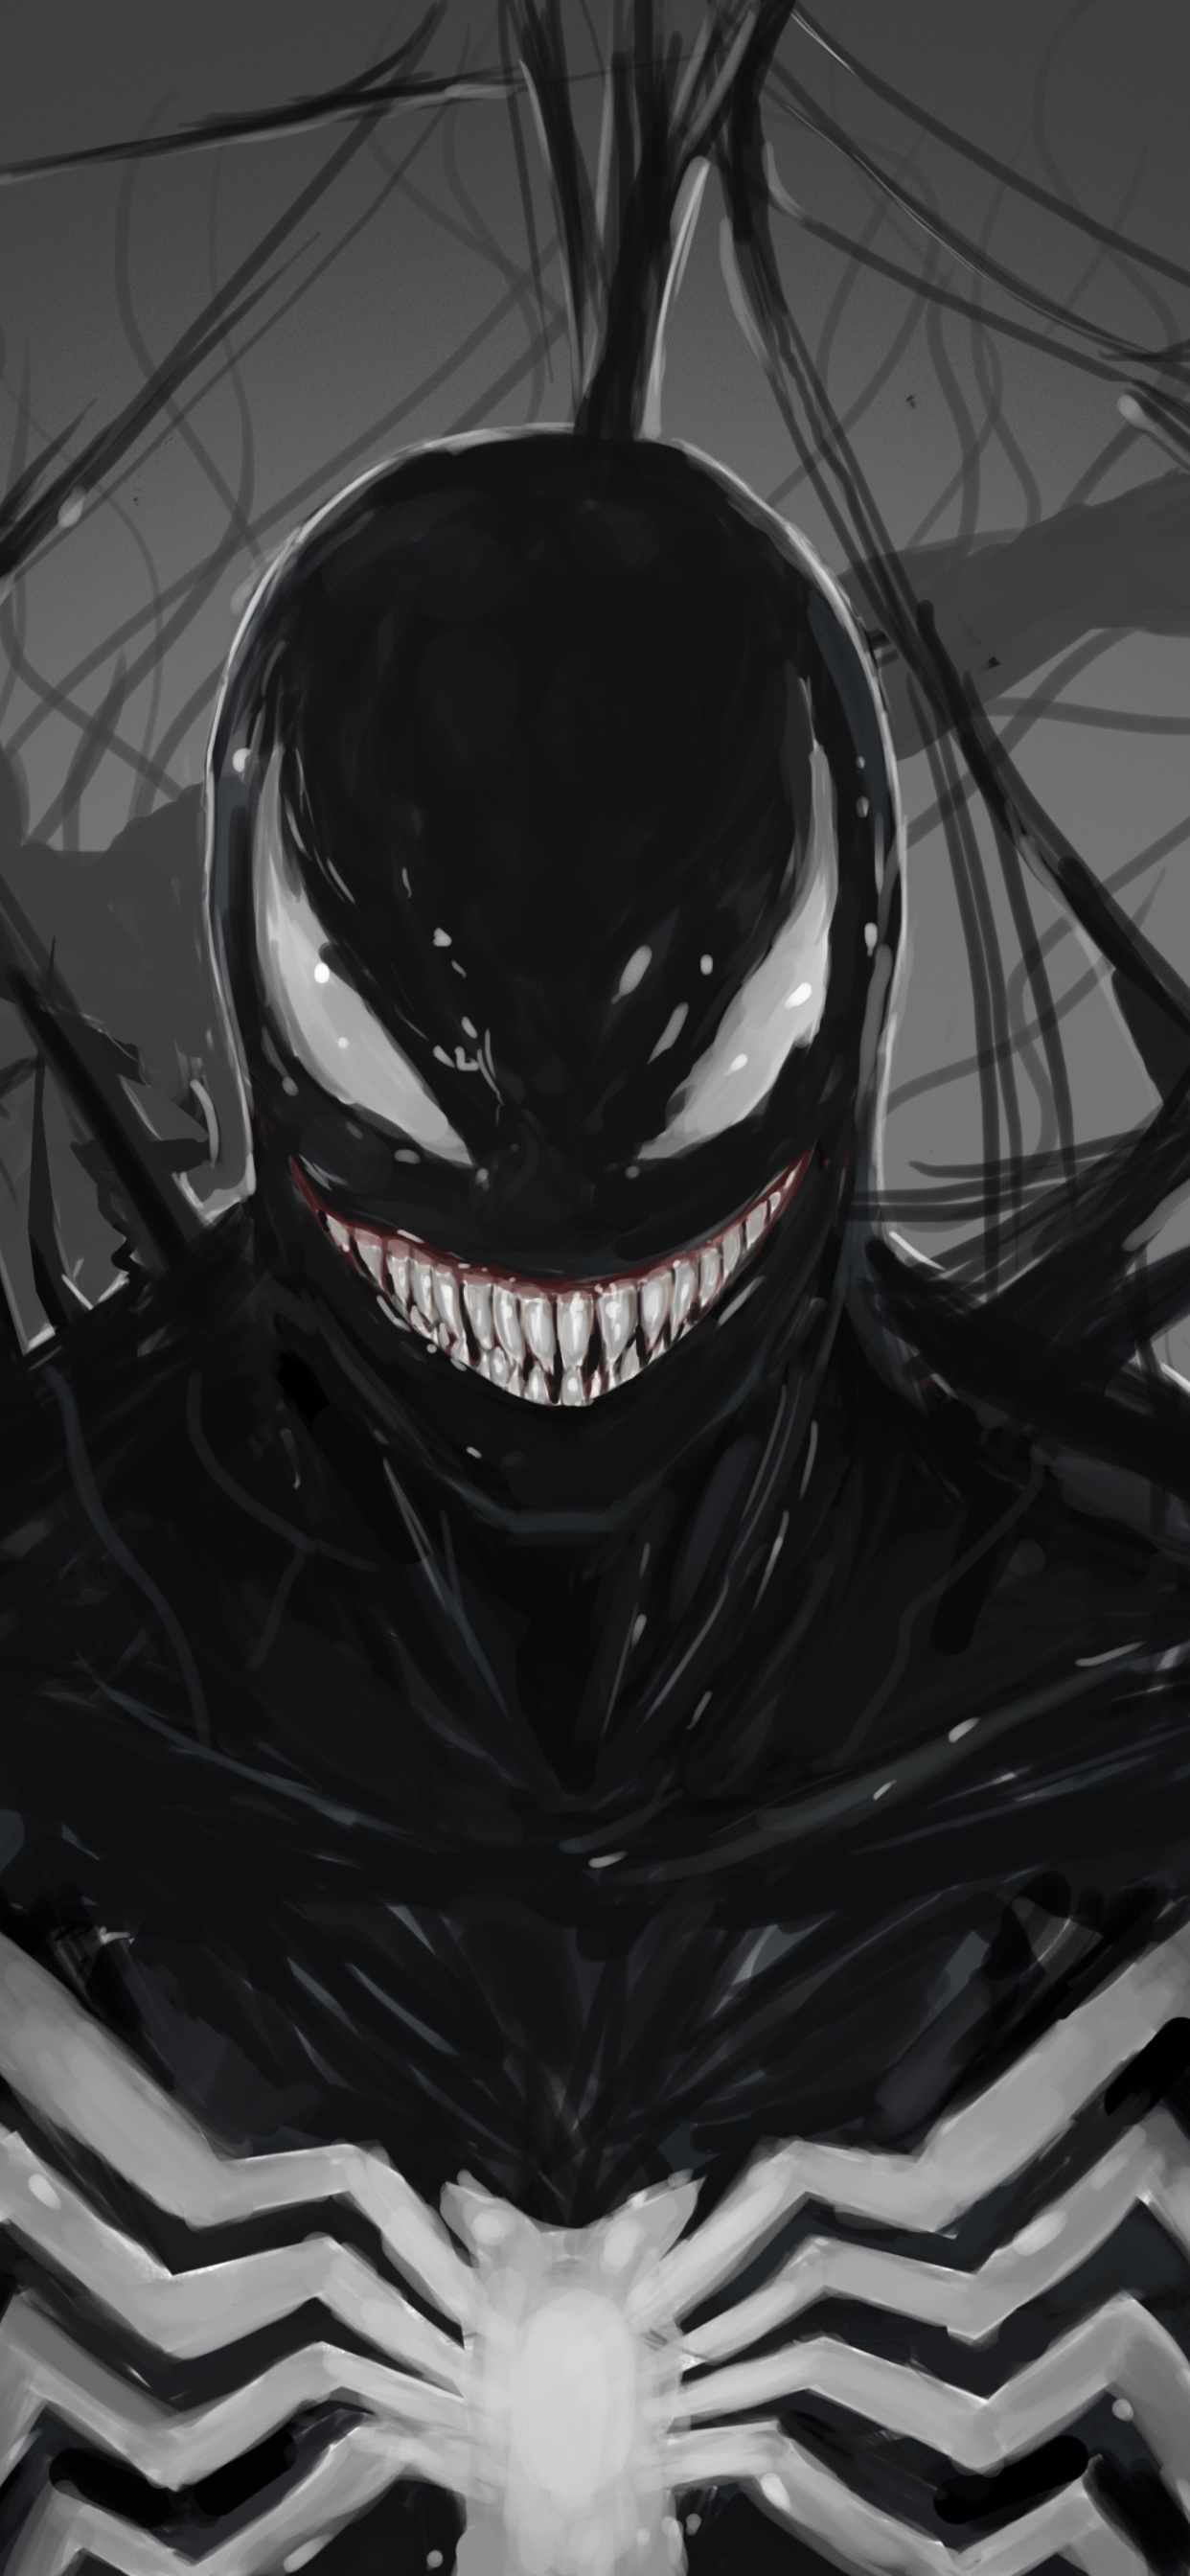 Venom Wallpaper Iphone Xs Max Download The New Iphone